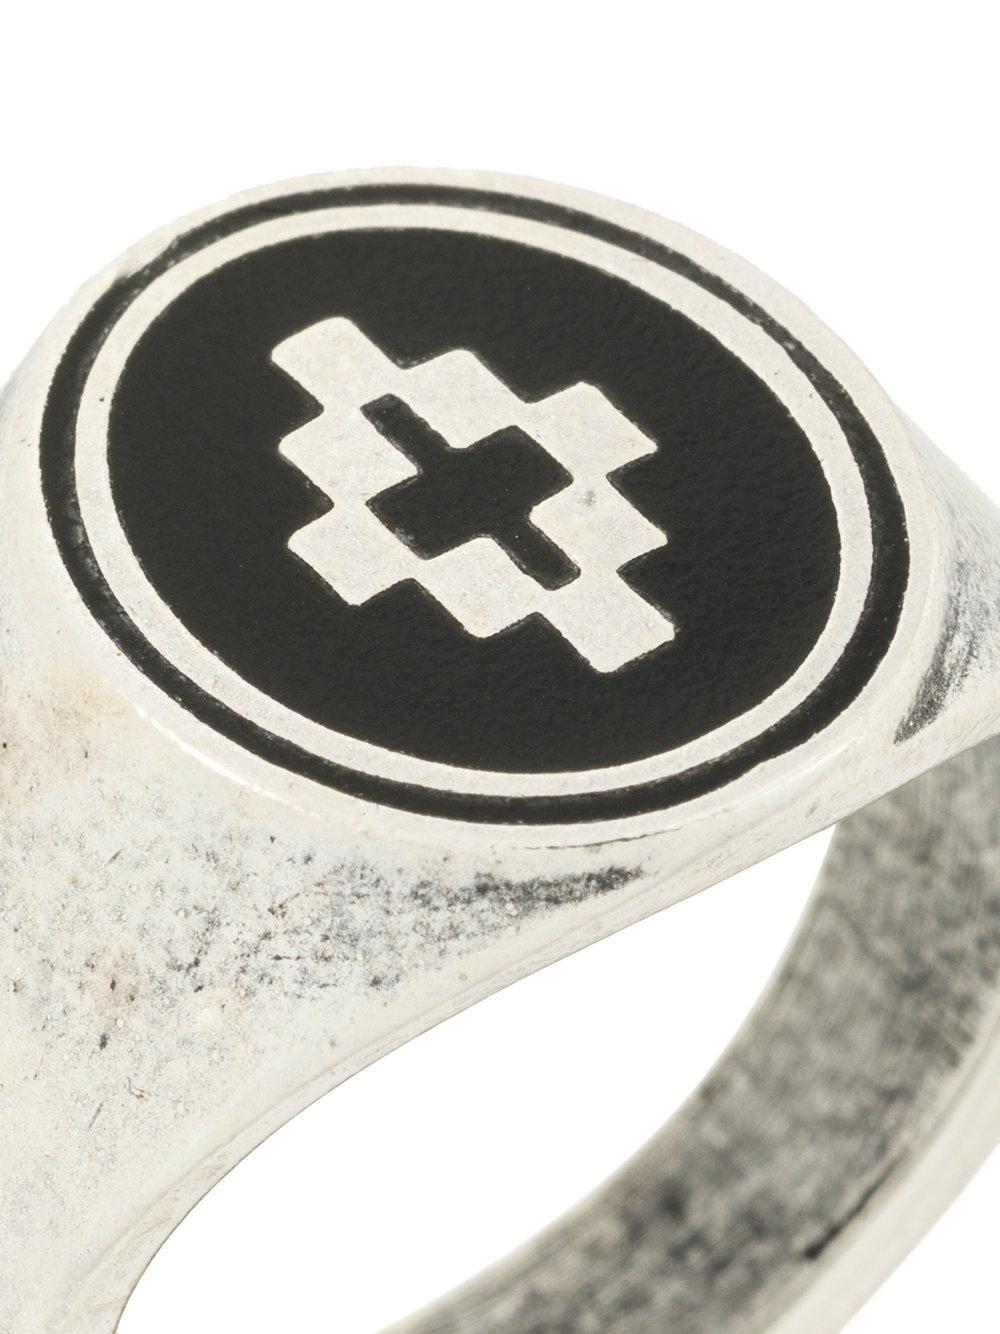 Cross ring - Metallic Marcelo Burlon Ektec